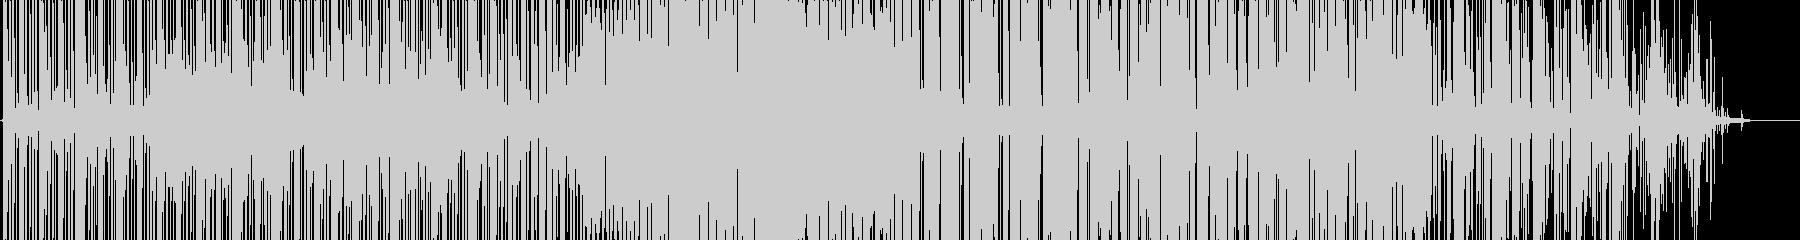 FUNE の未再生の波形